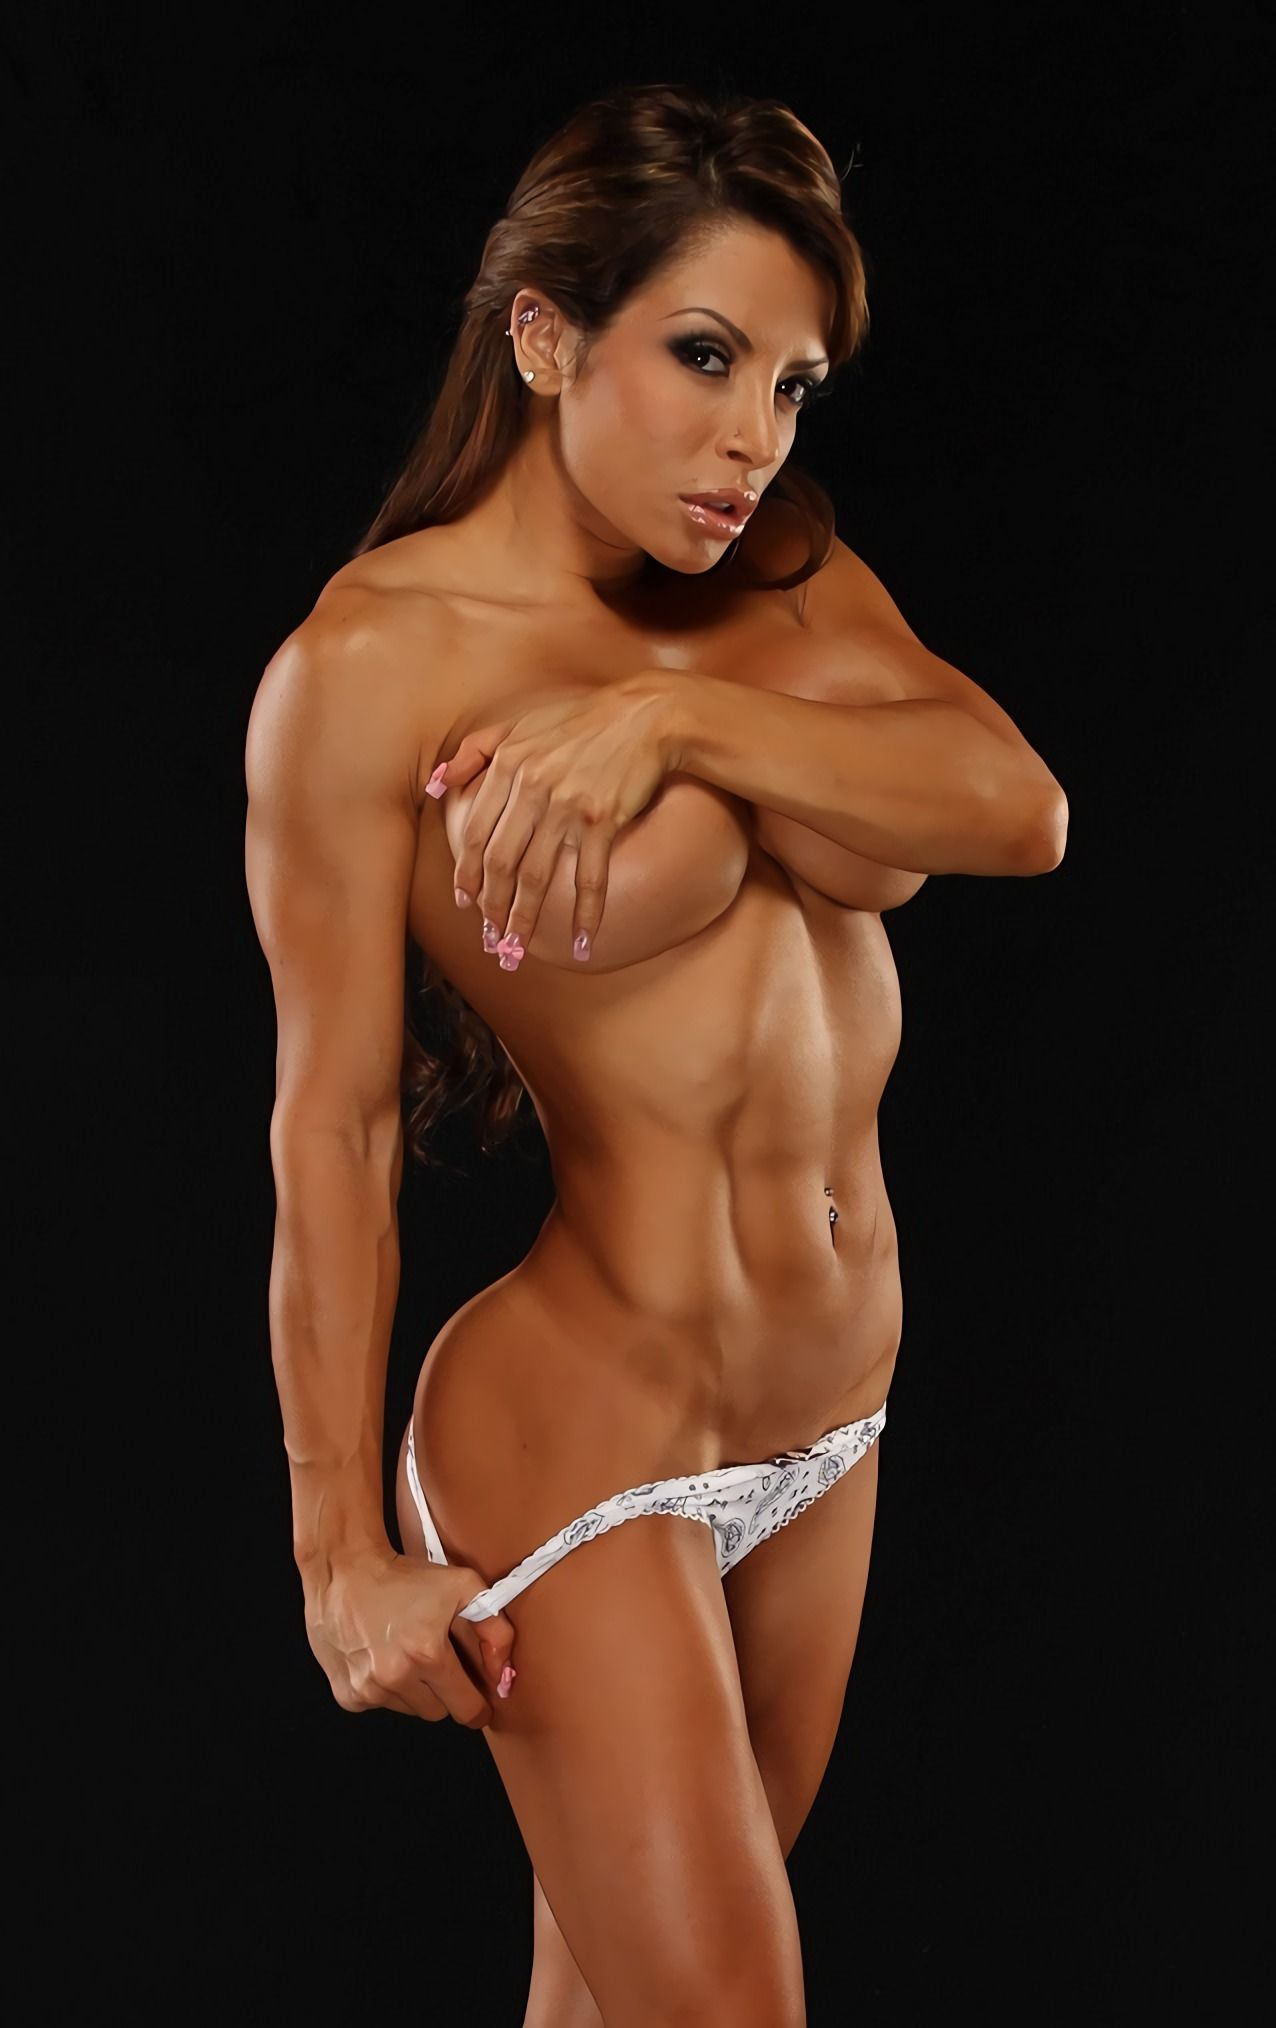 Emo femme fatale female bodybuilder